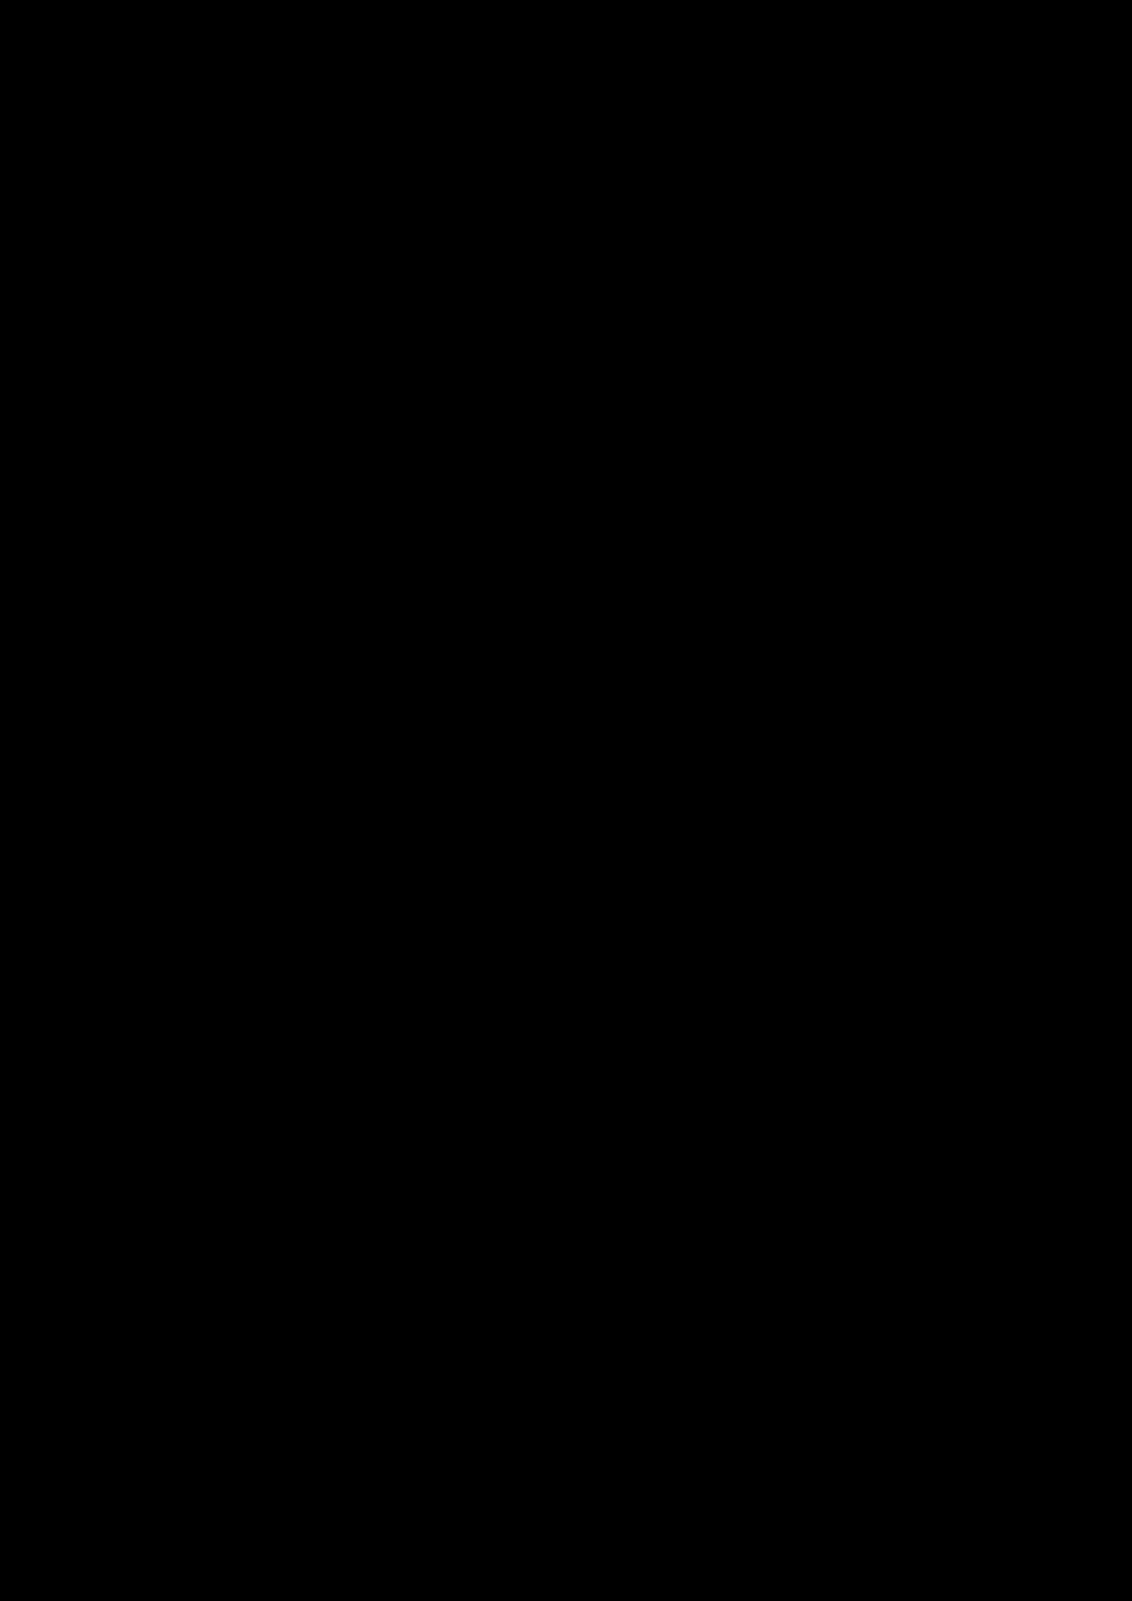 Ten lyubvi slide, Image 56